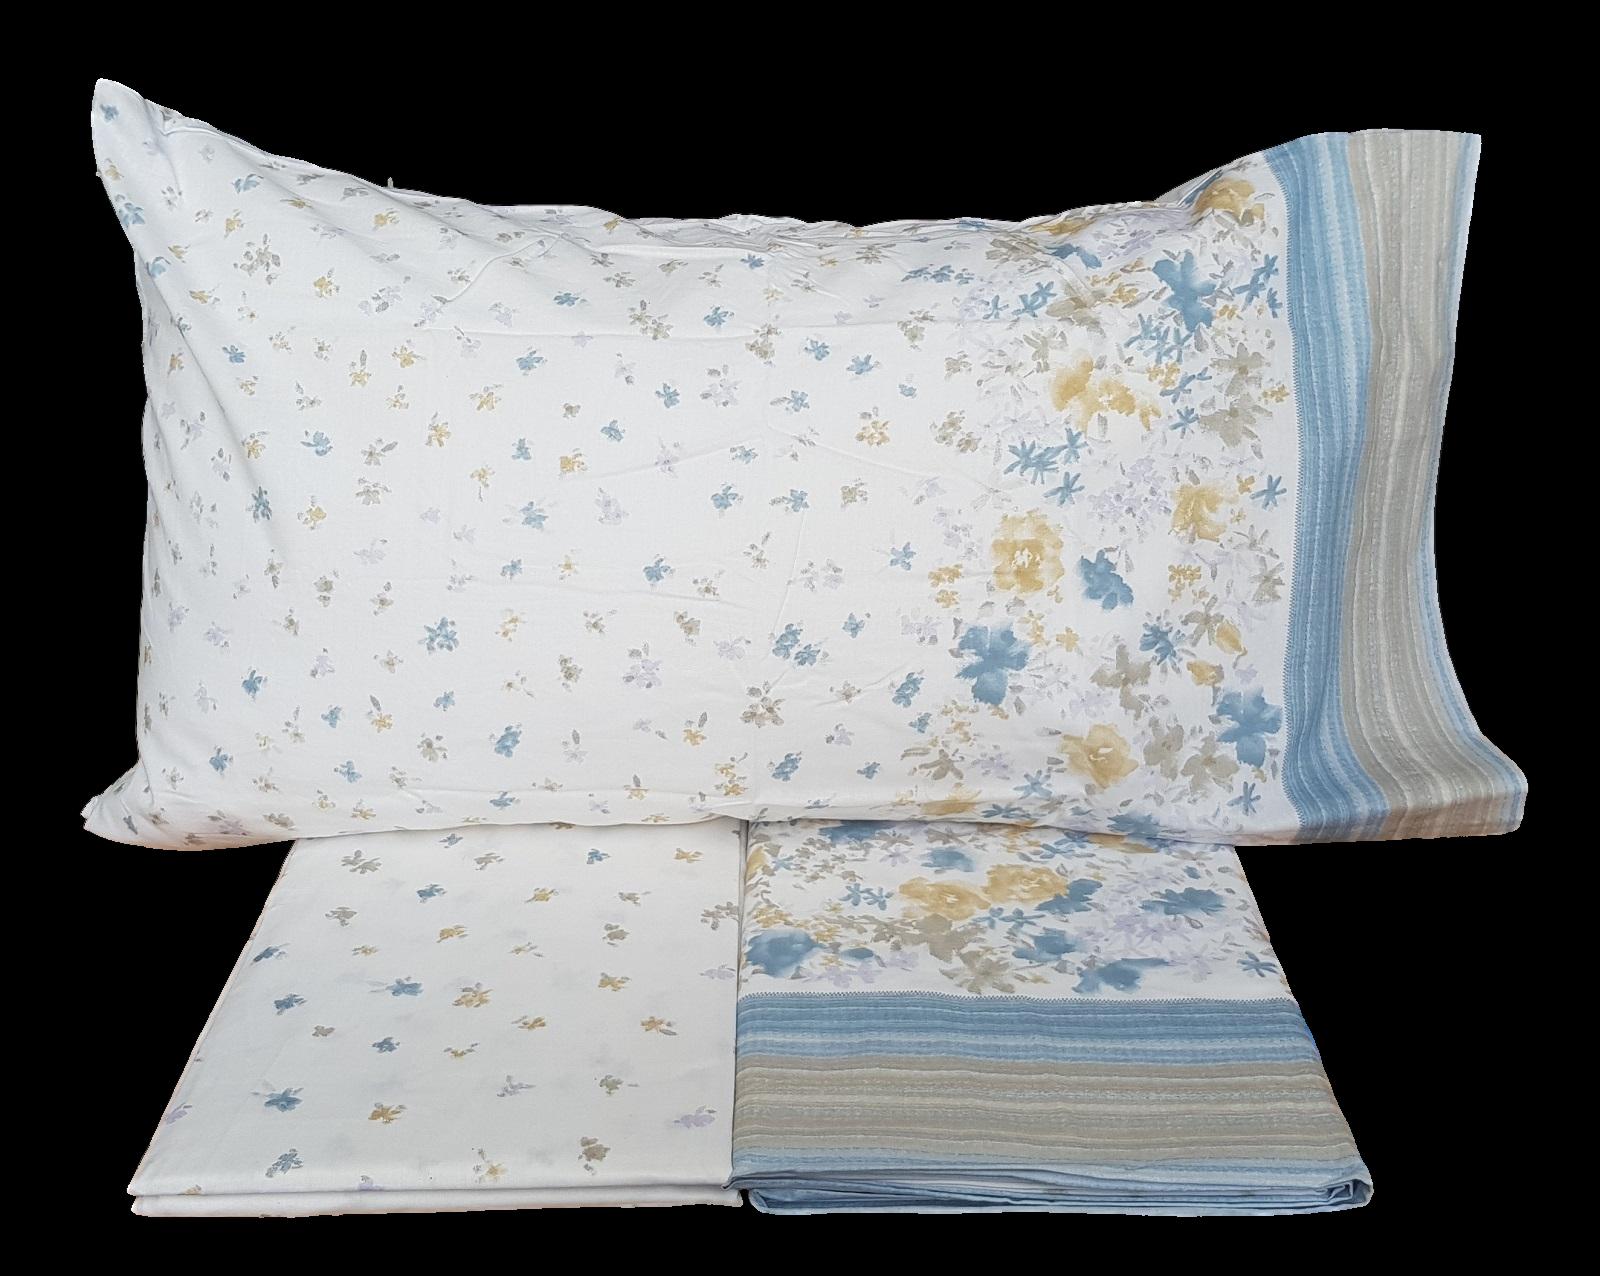 MAE' SUMMIT Lenzuola completo set letto 100% Cotone 150/180 fili Made in Italy